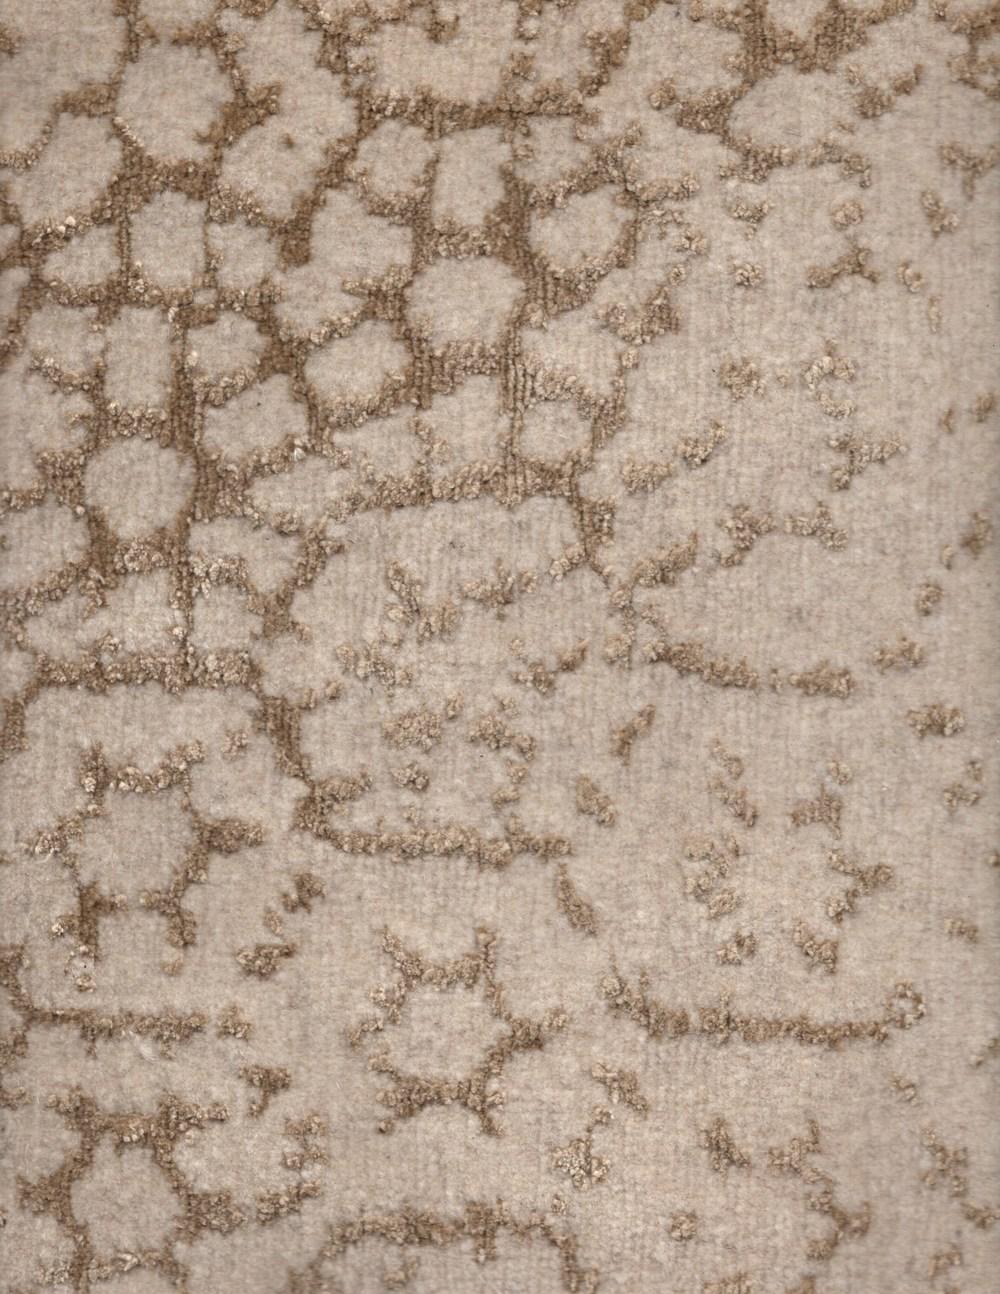 Madera - Wool + SIlk